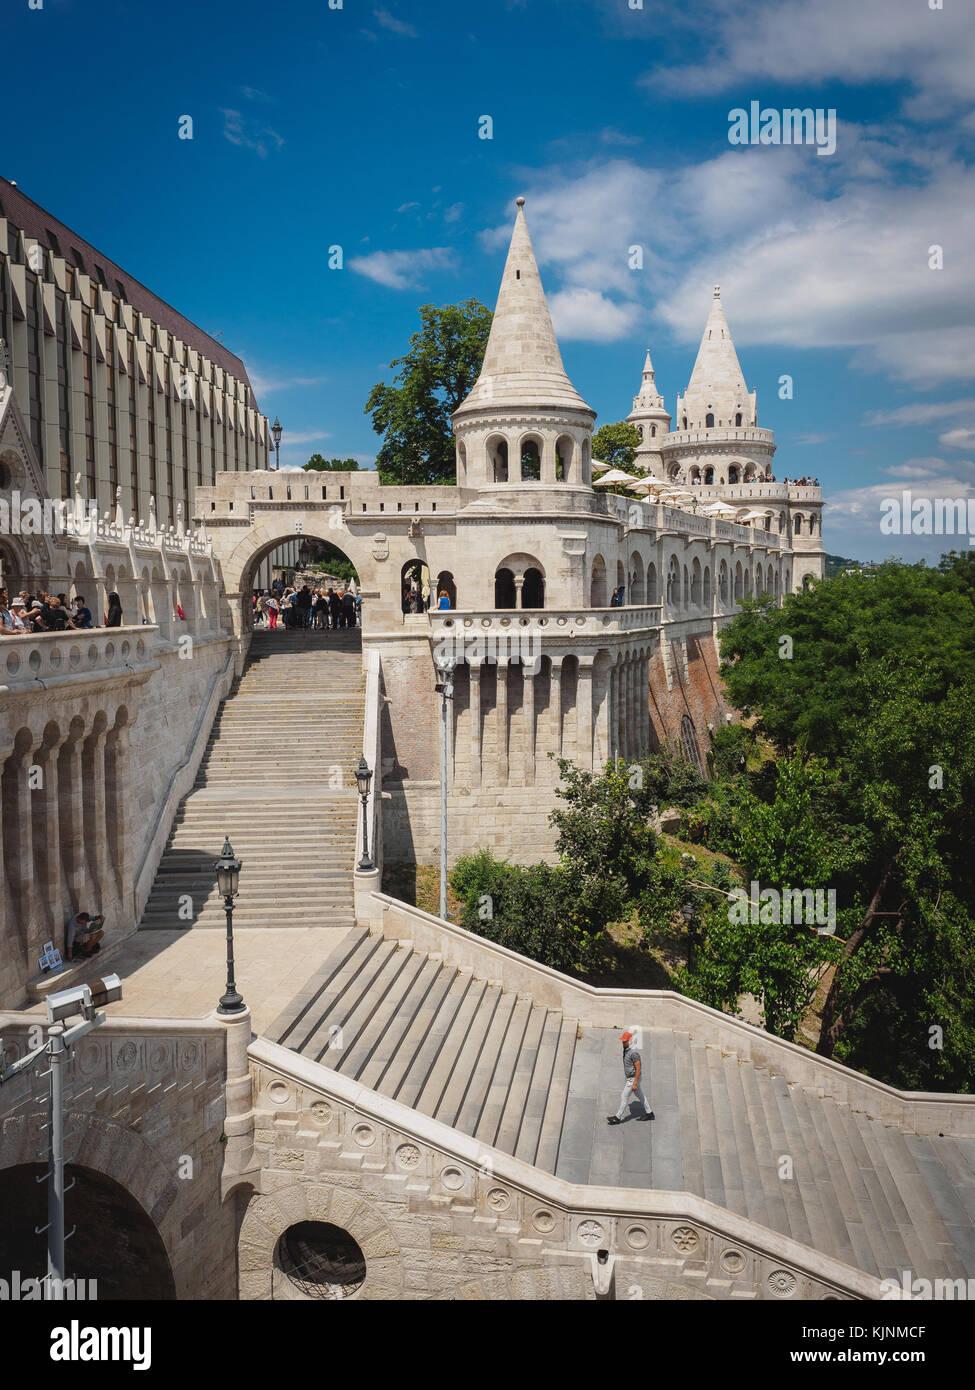 View of the Halaszbastya (Fisherman's Bastion) in Budapest (Hungary). June 2017. Portrait format. - Stock Image